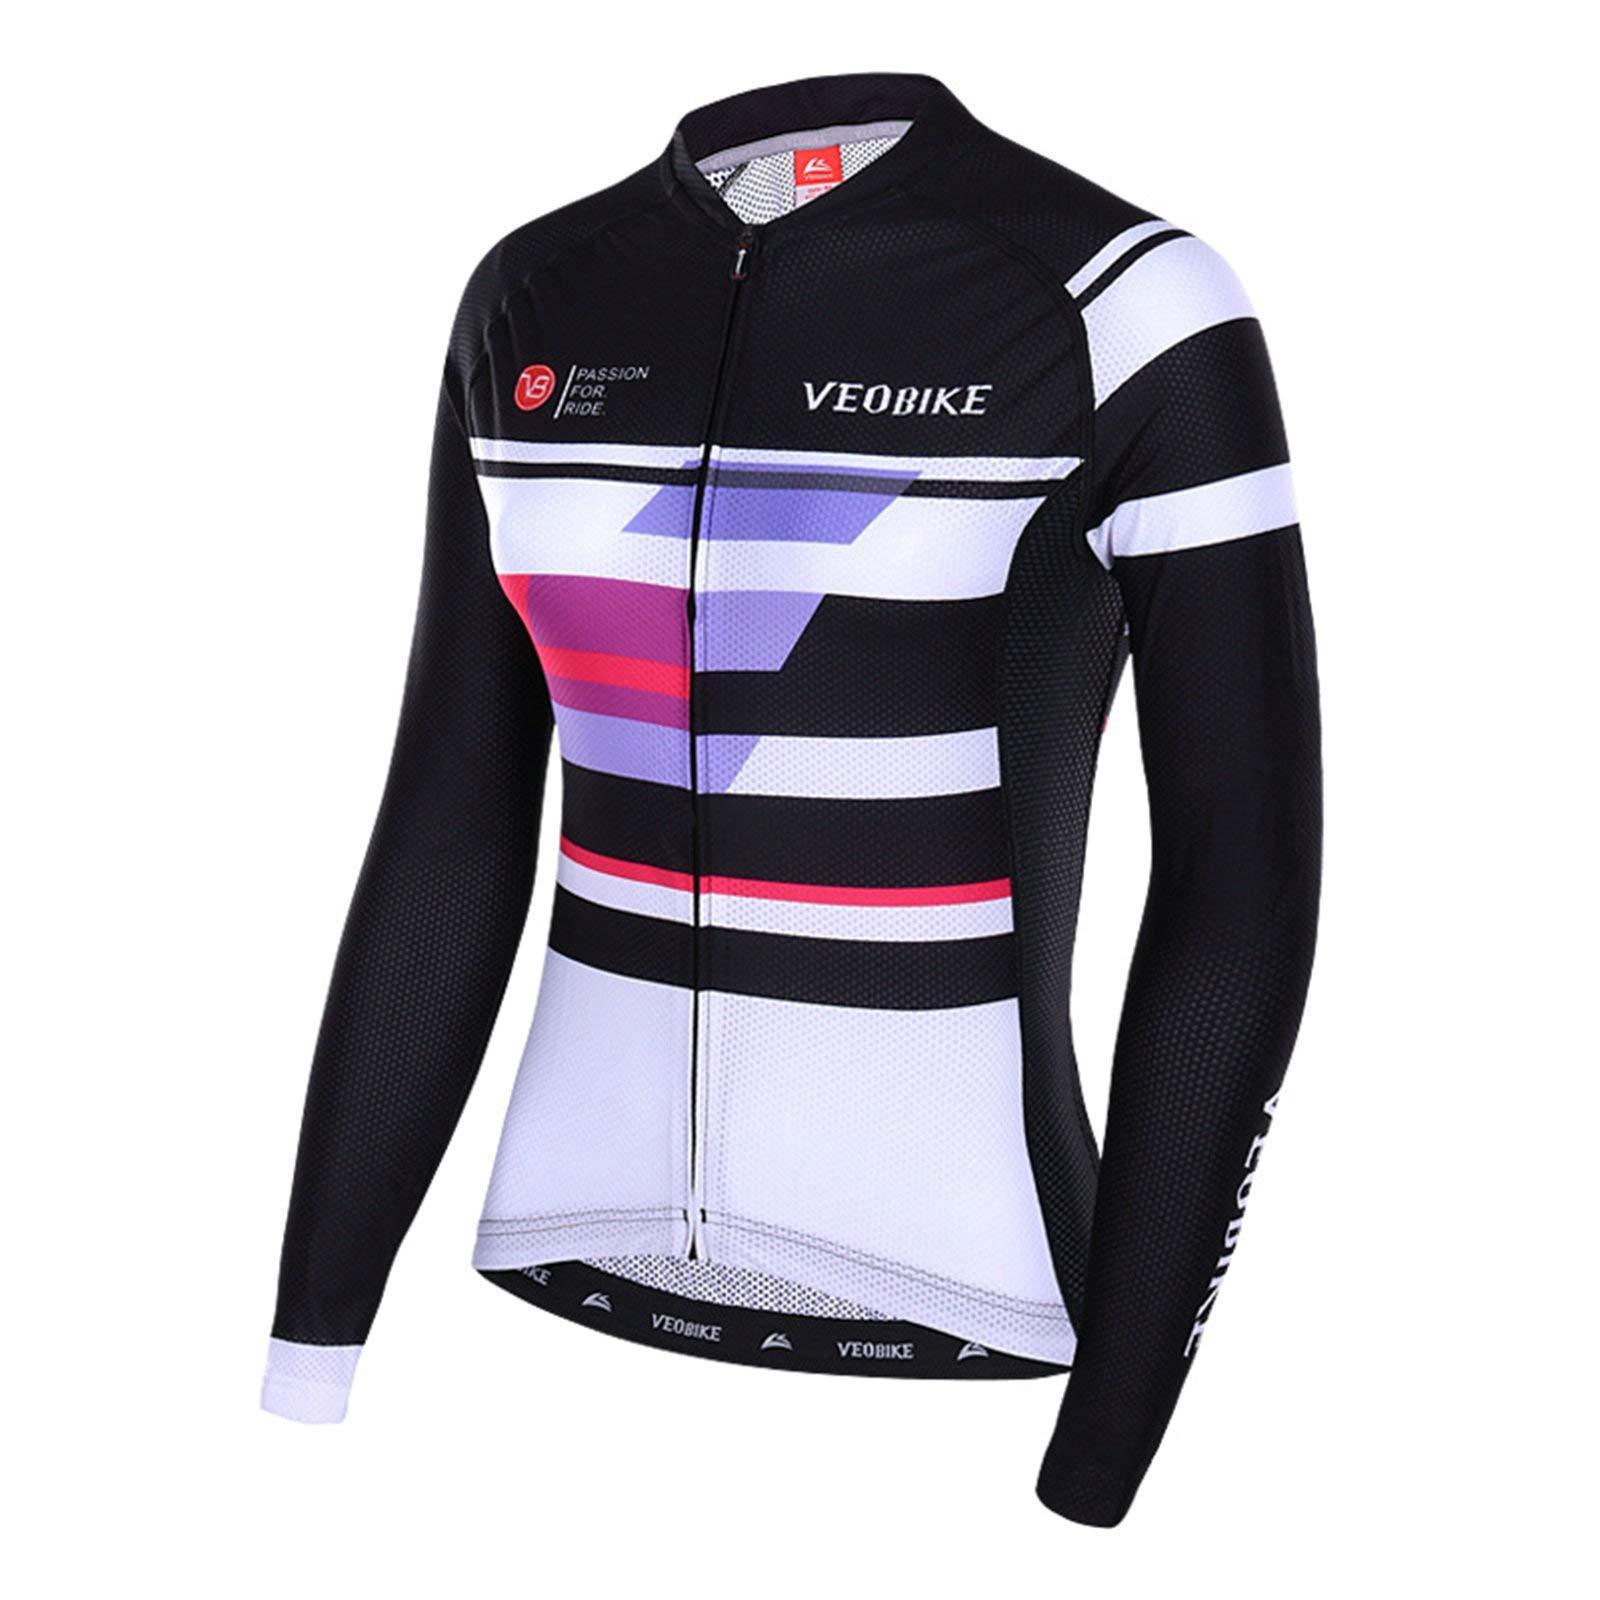 Aooaz Women's Cycling Clothes Full Sleeve Riding Wear Long Sleeve Mountain Bike T Shirts Black Size S